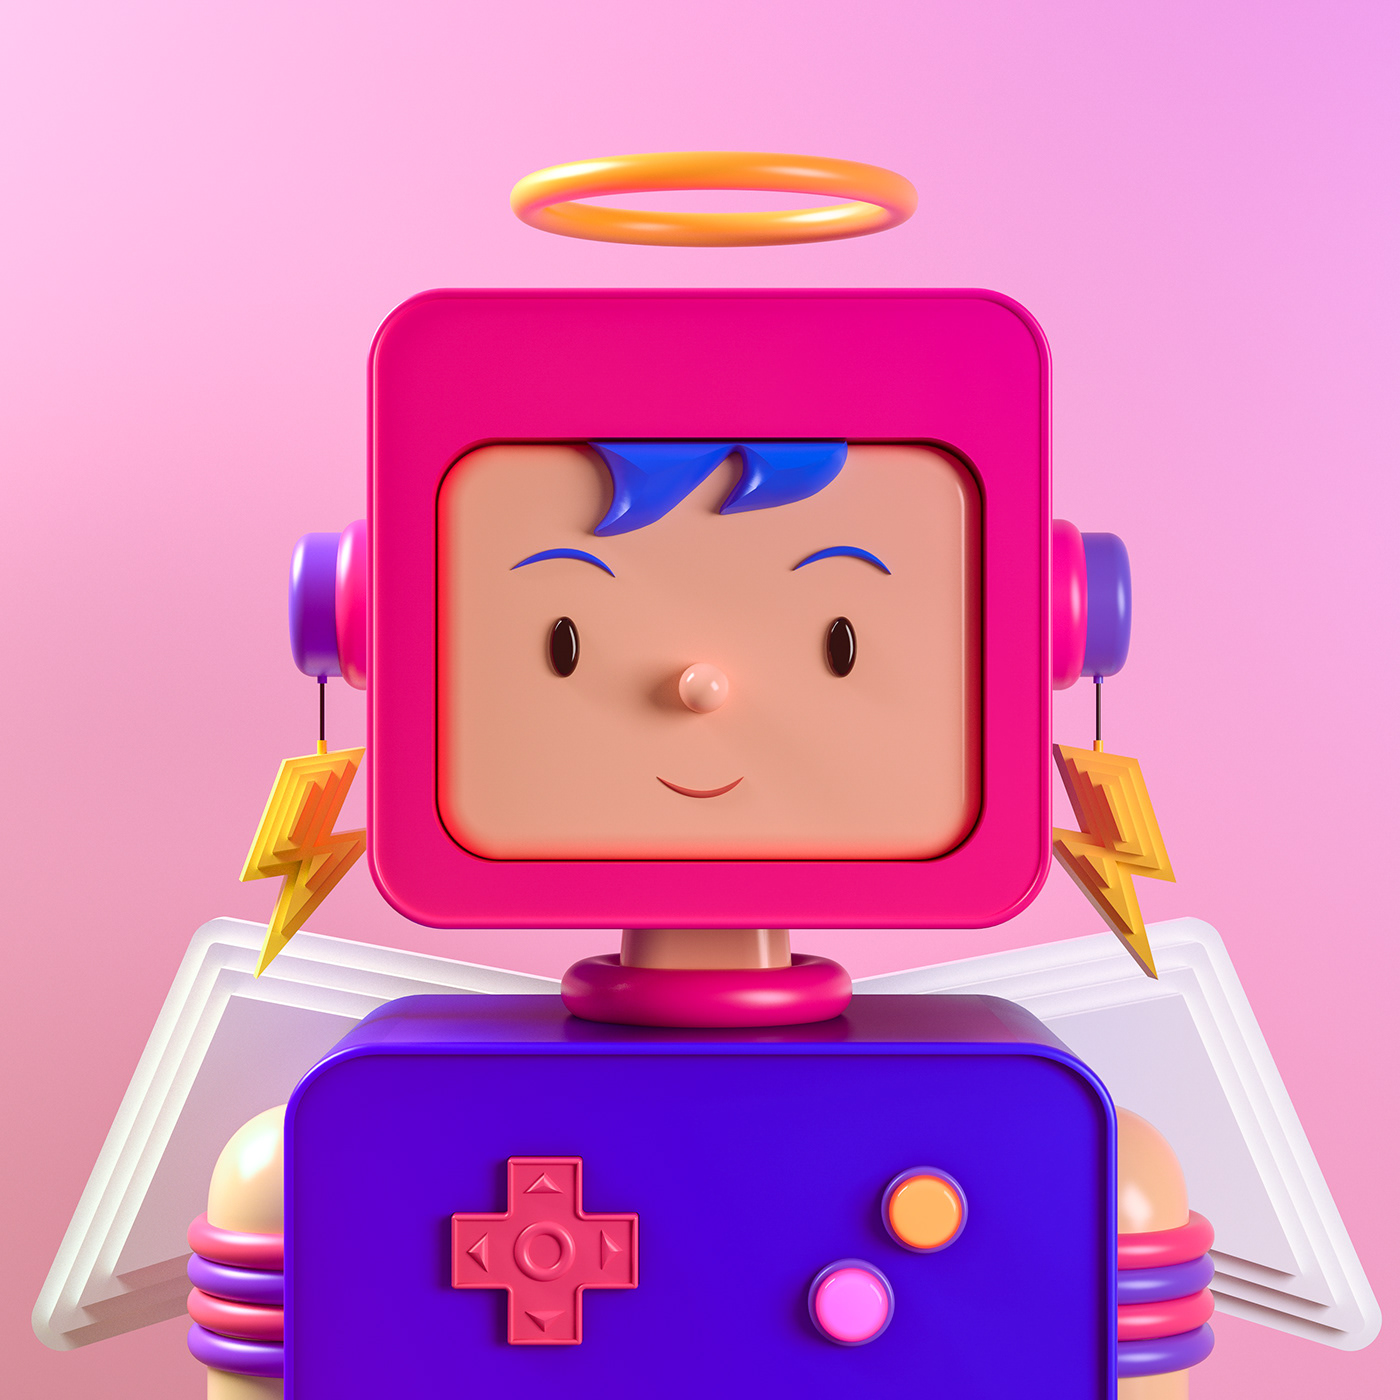 3D c4d characters Isometric nft NFTS rooms toys